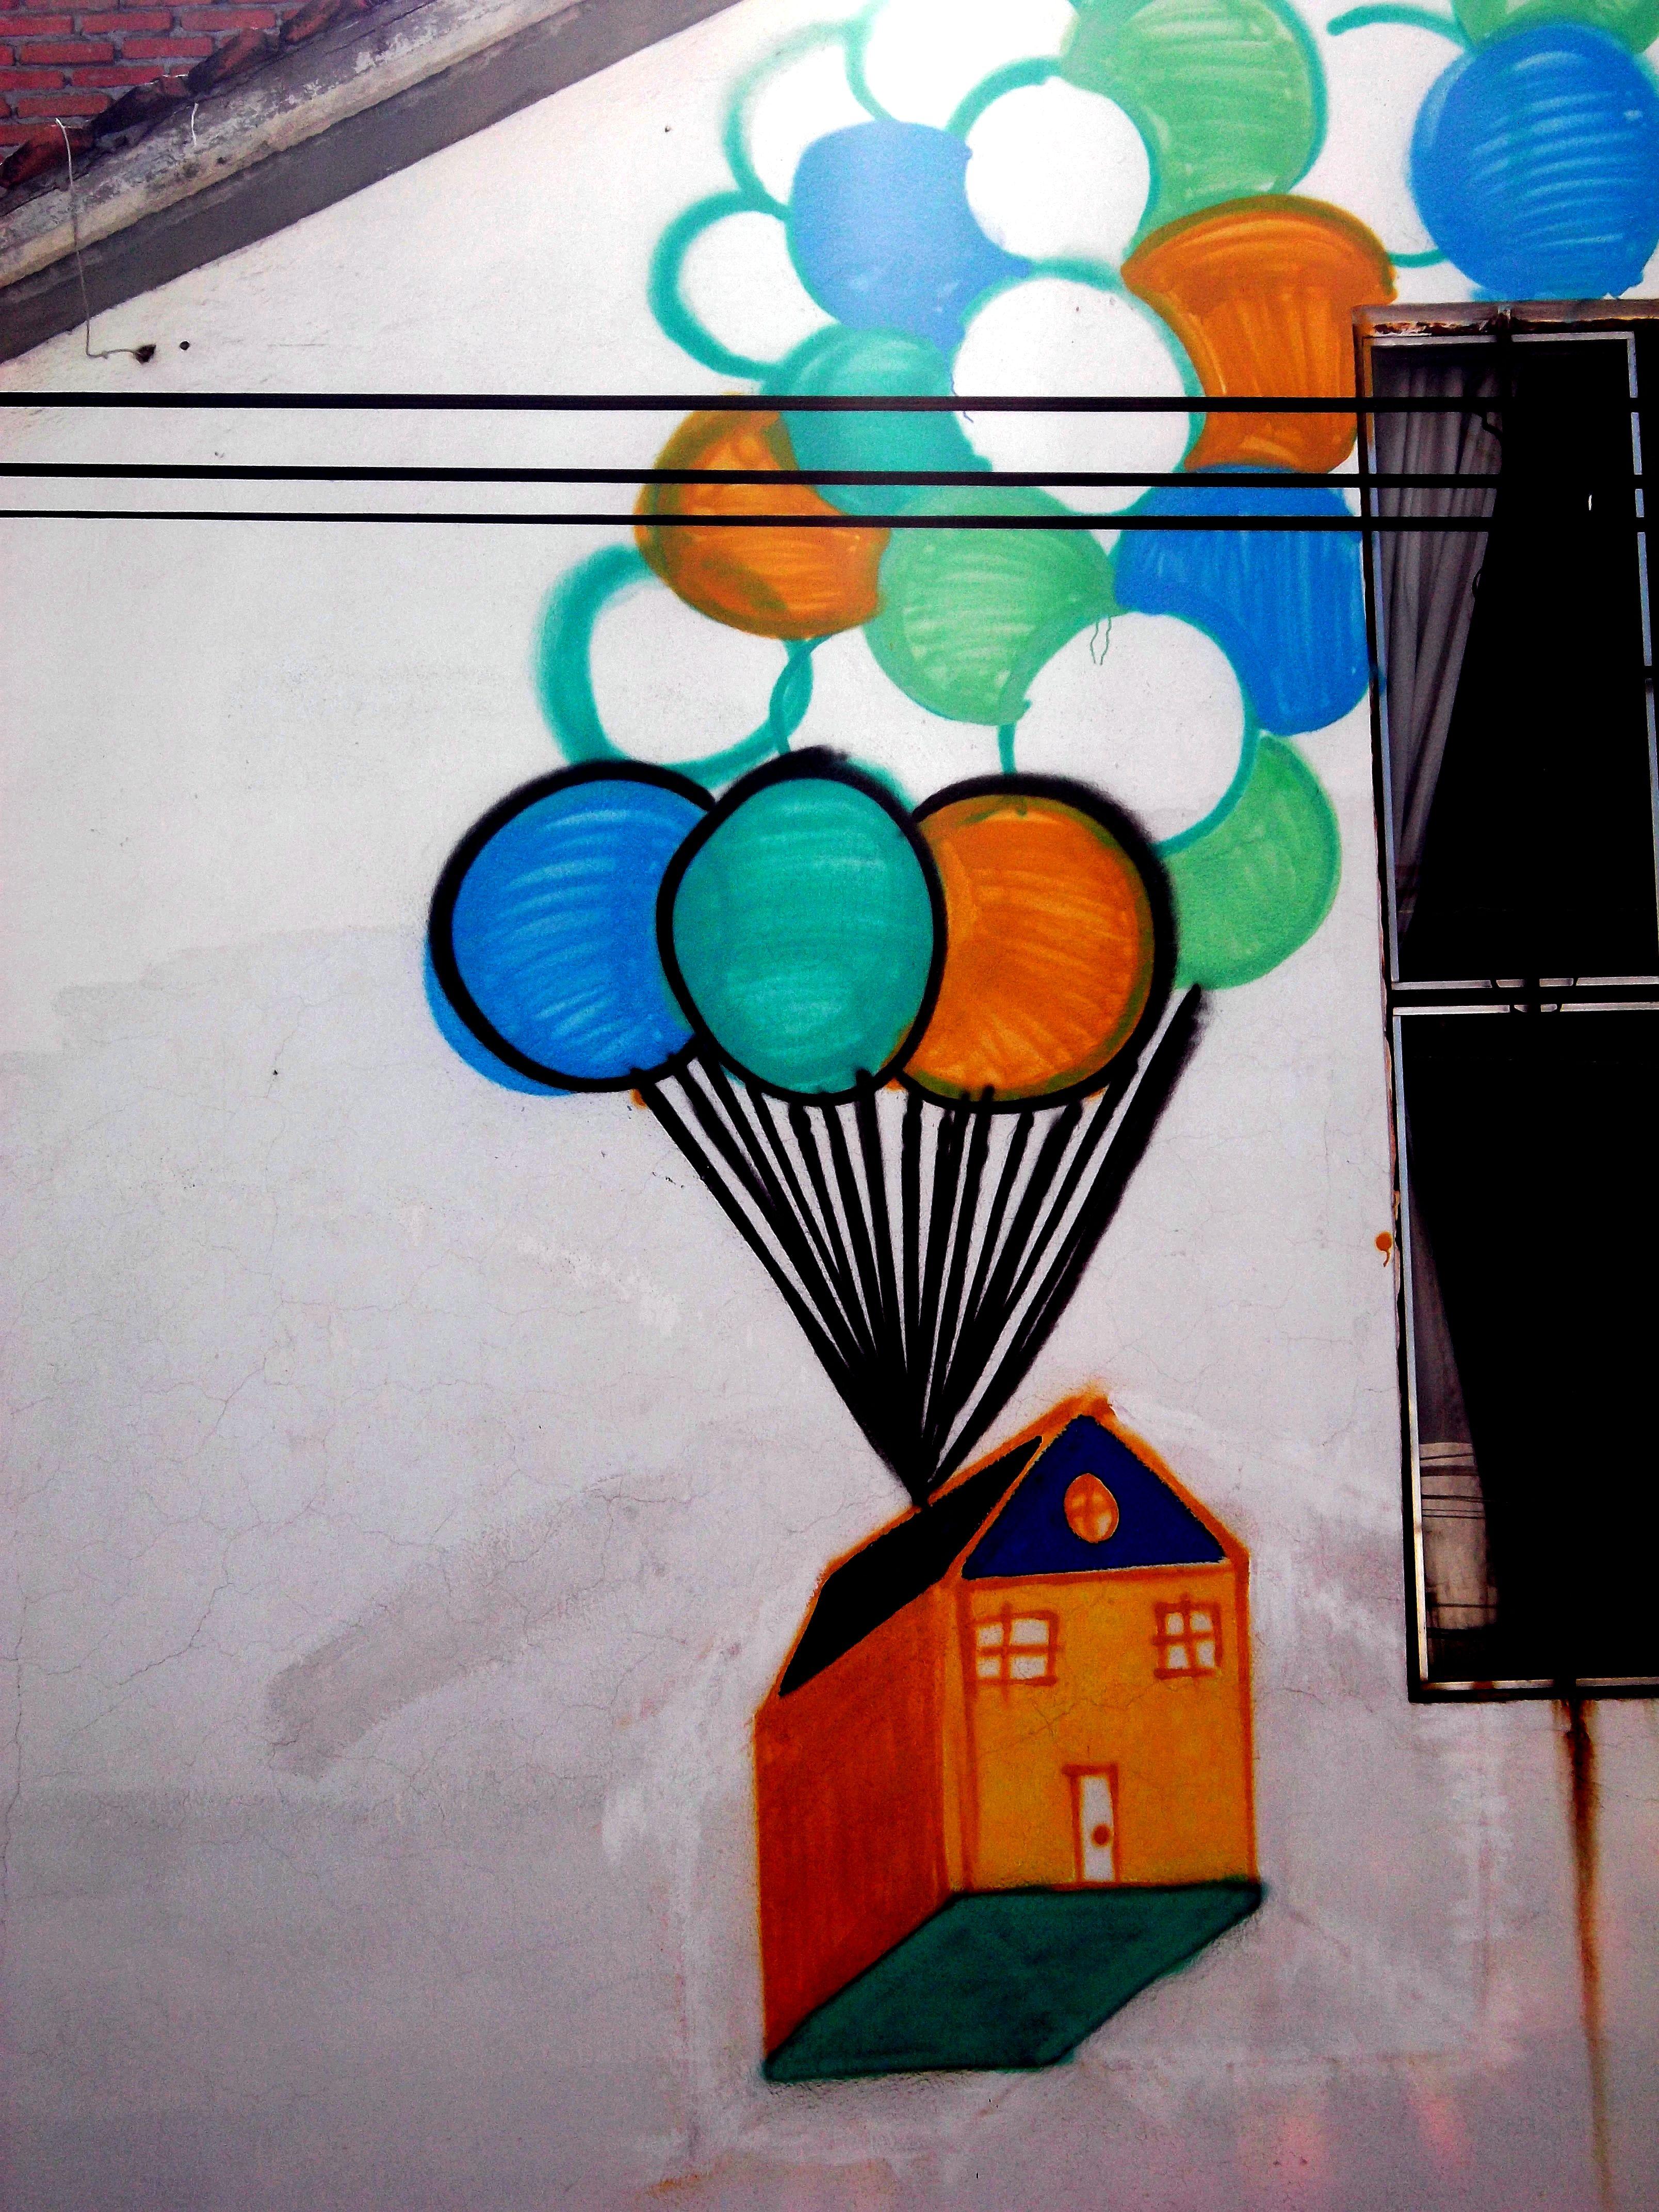 Aguascalietes, Aguascalientes, México | 27.nov.2013 | Foto: Daniel Froes (CC BY-NC-SA) | La calle habla.